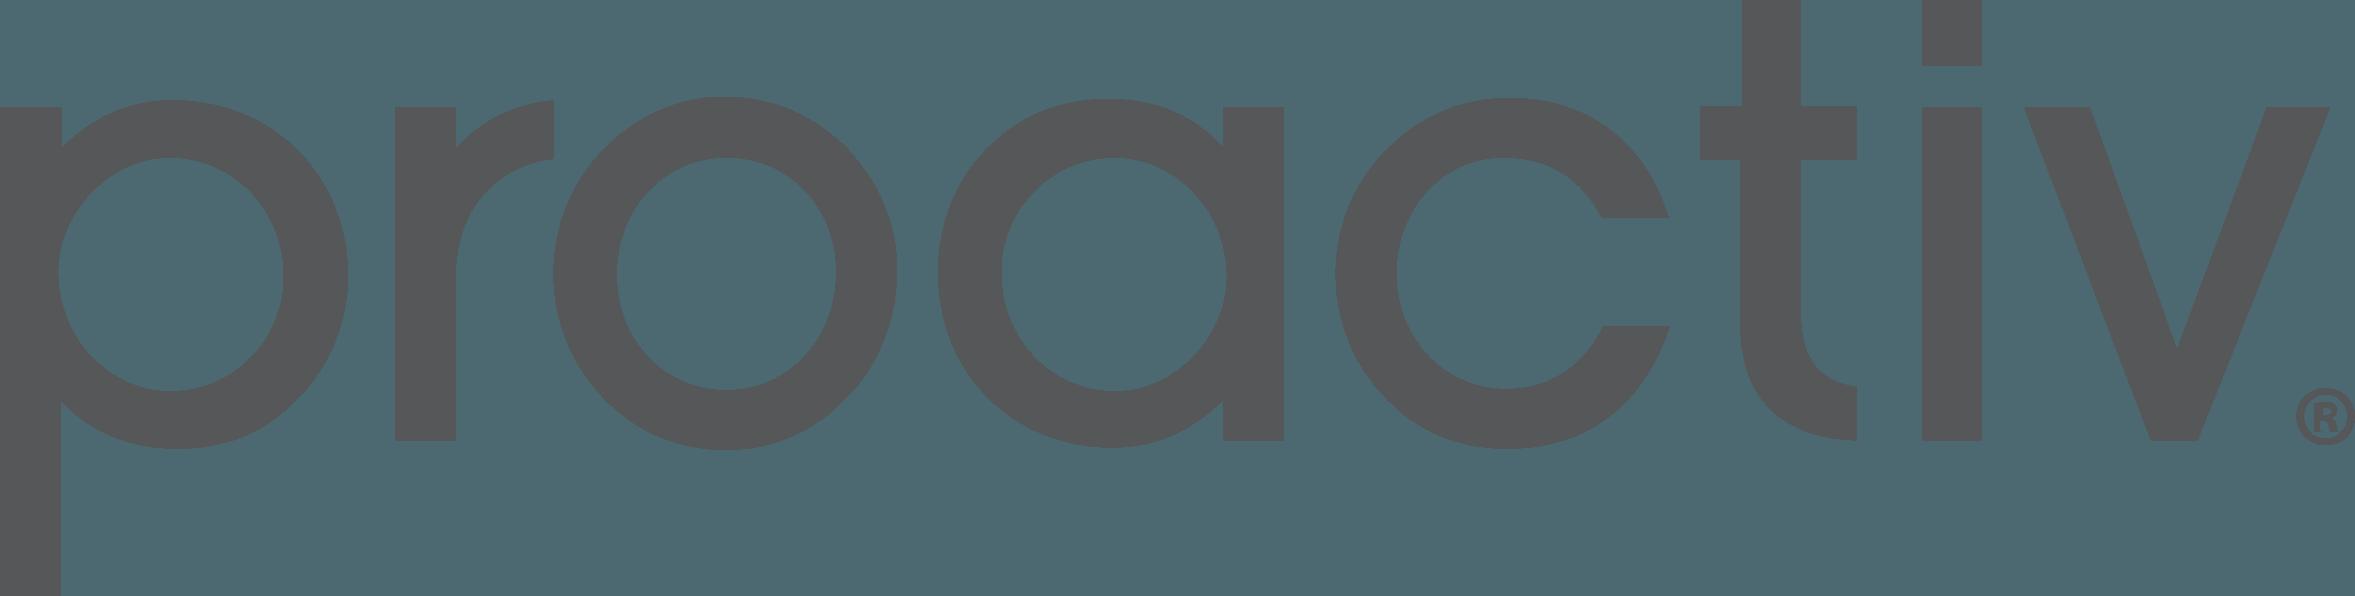 Proactiv Logo png